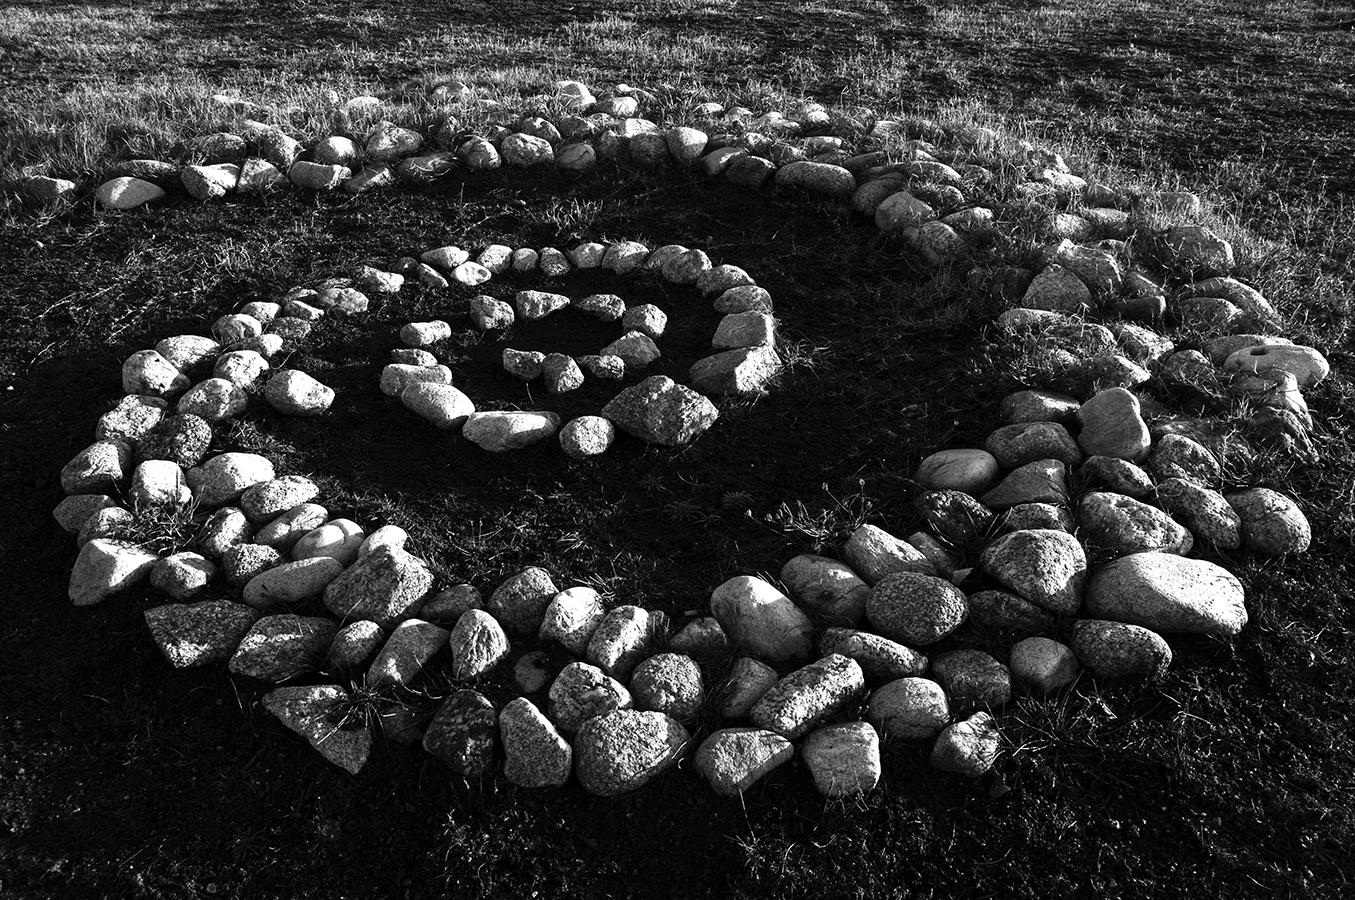 Piedras geométricas | 2011 | A Coruña, España - Geometric rocks | 2011 | A Coruña, Spain - Miguel Naya | Photography